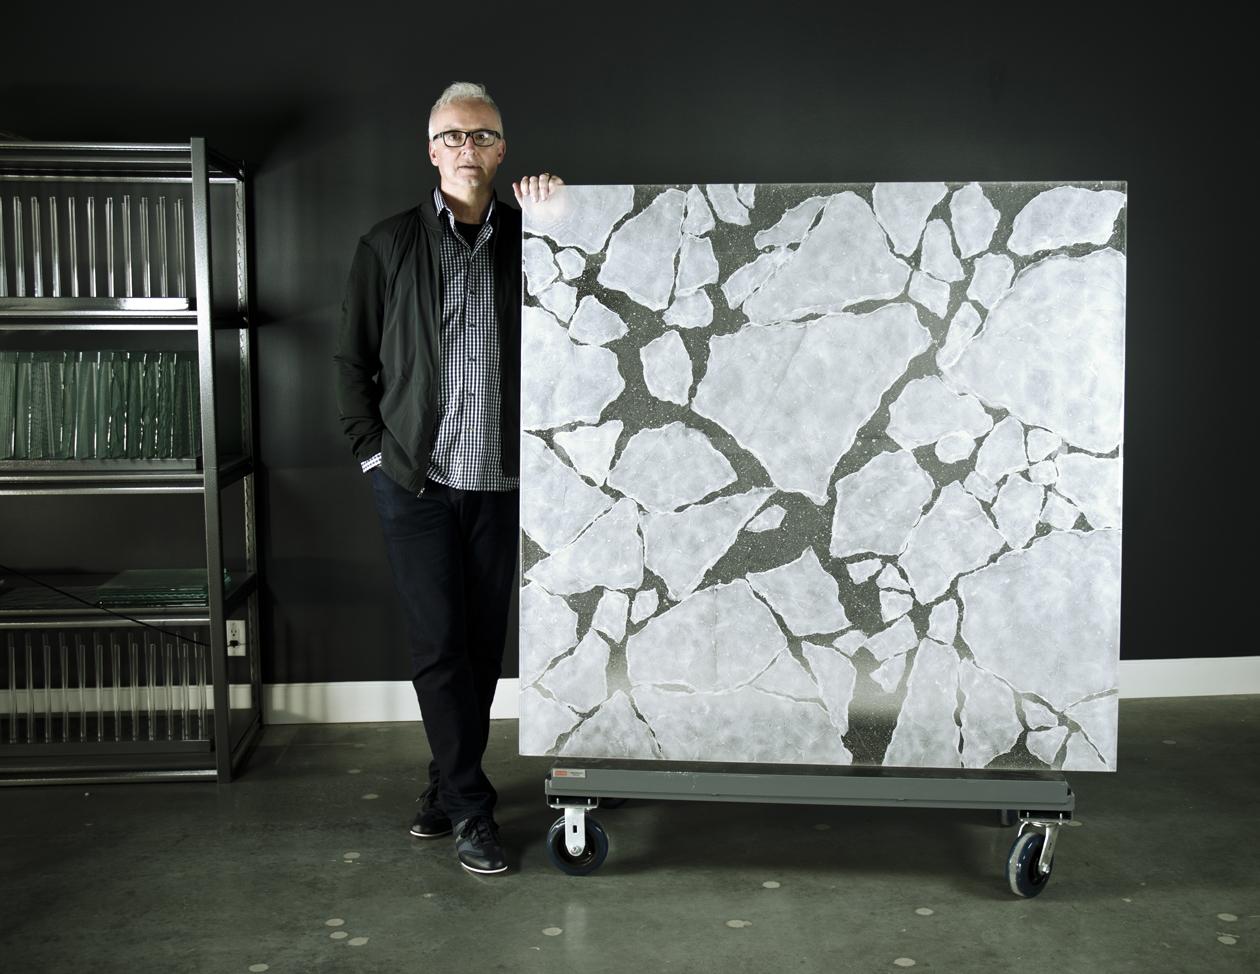 Iceberg glass story